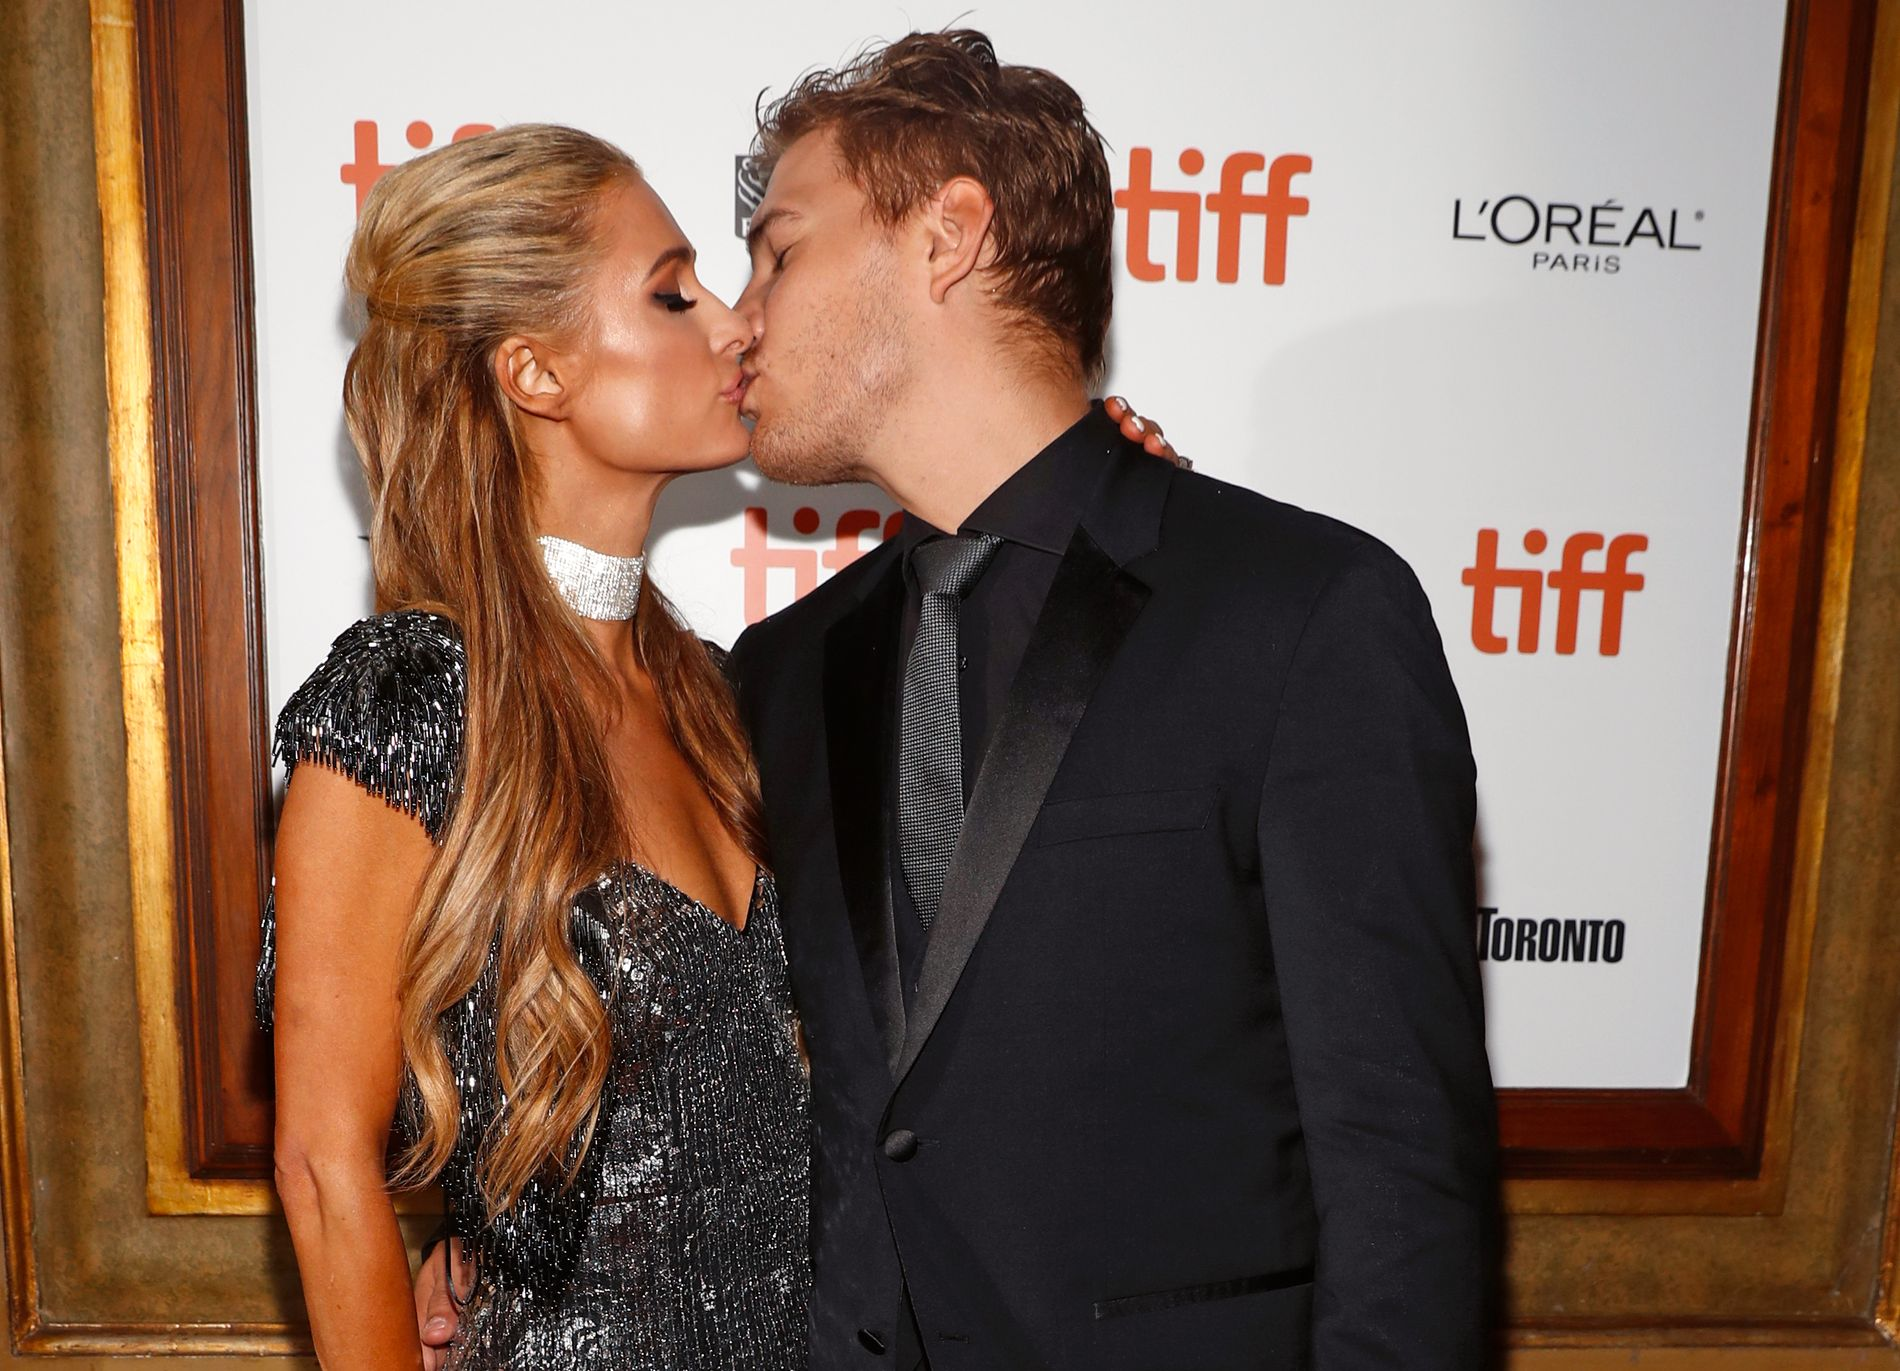 ANIMALS: Paris Hilton received an actor's ring worth 16 million.